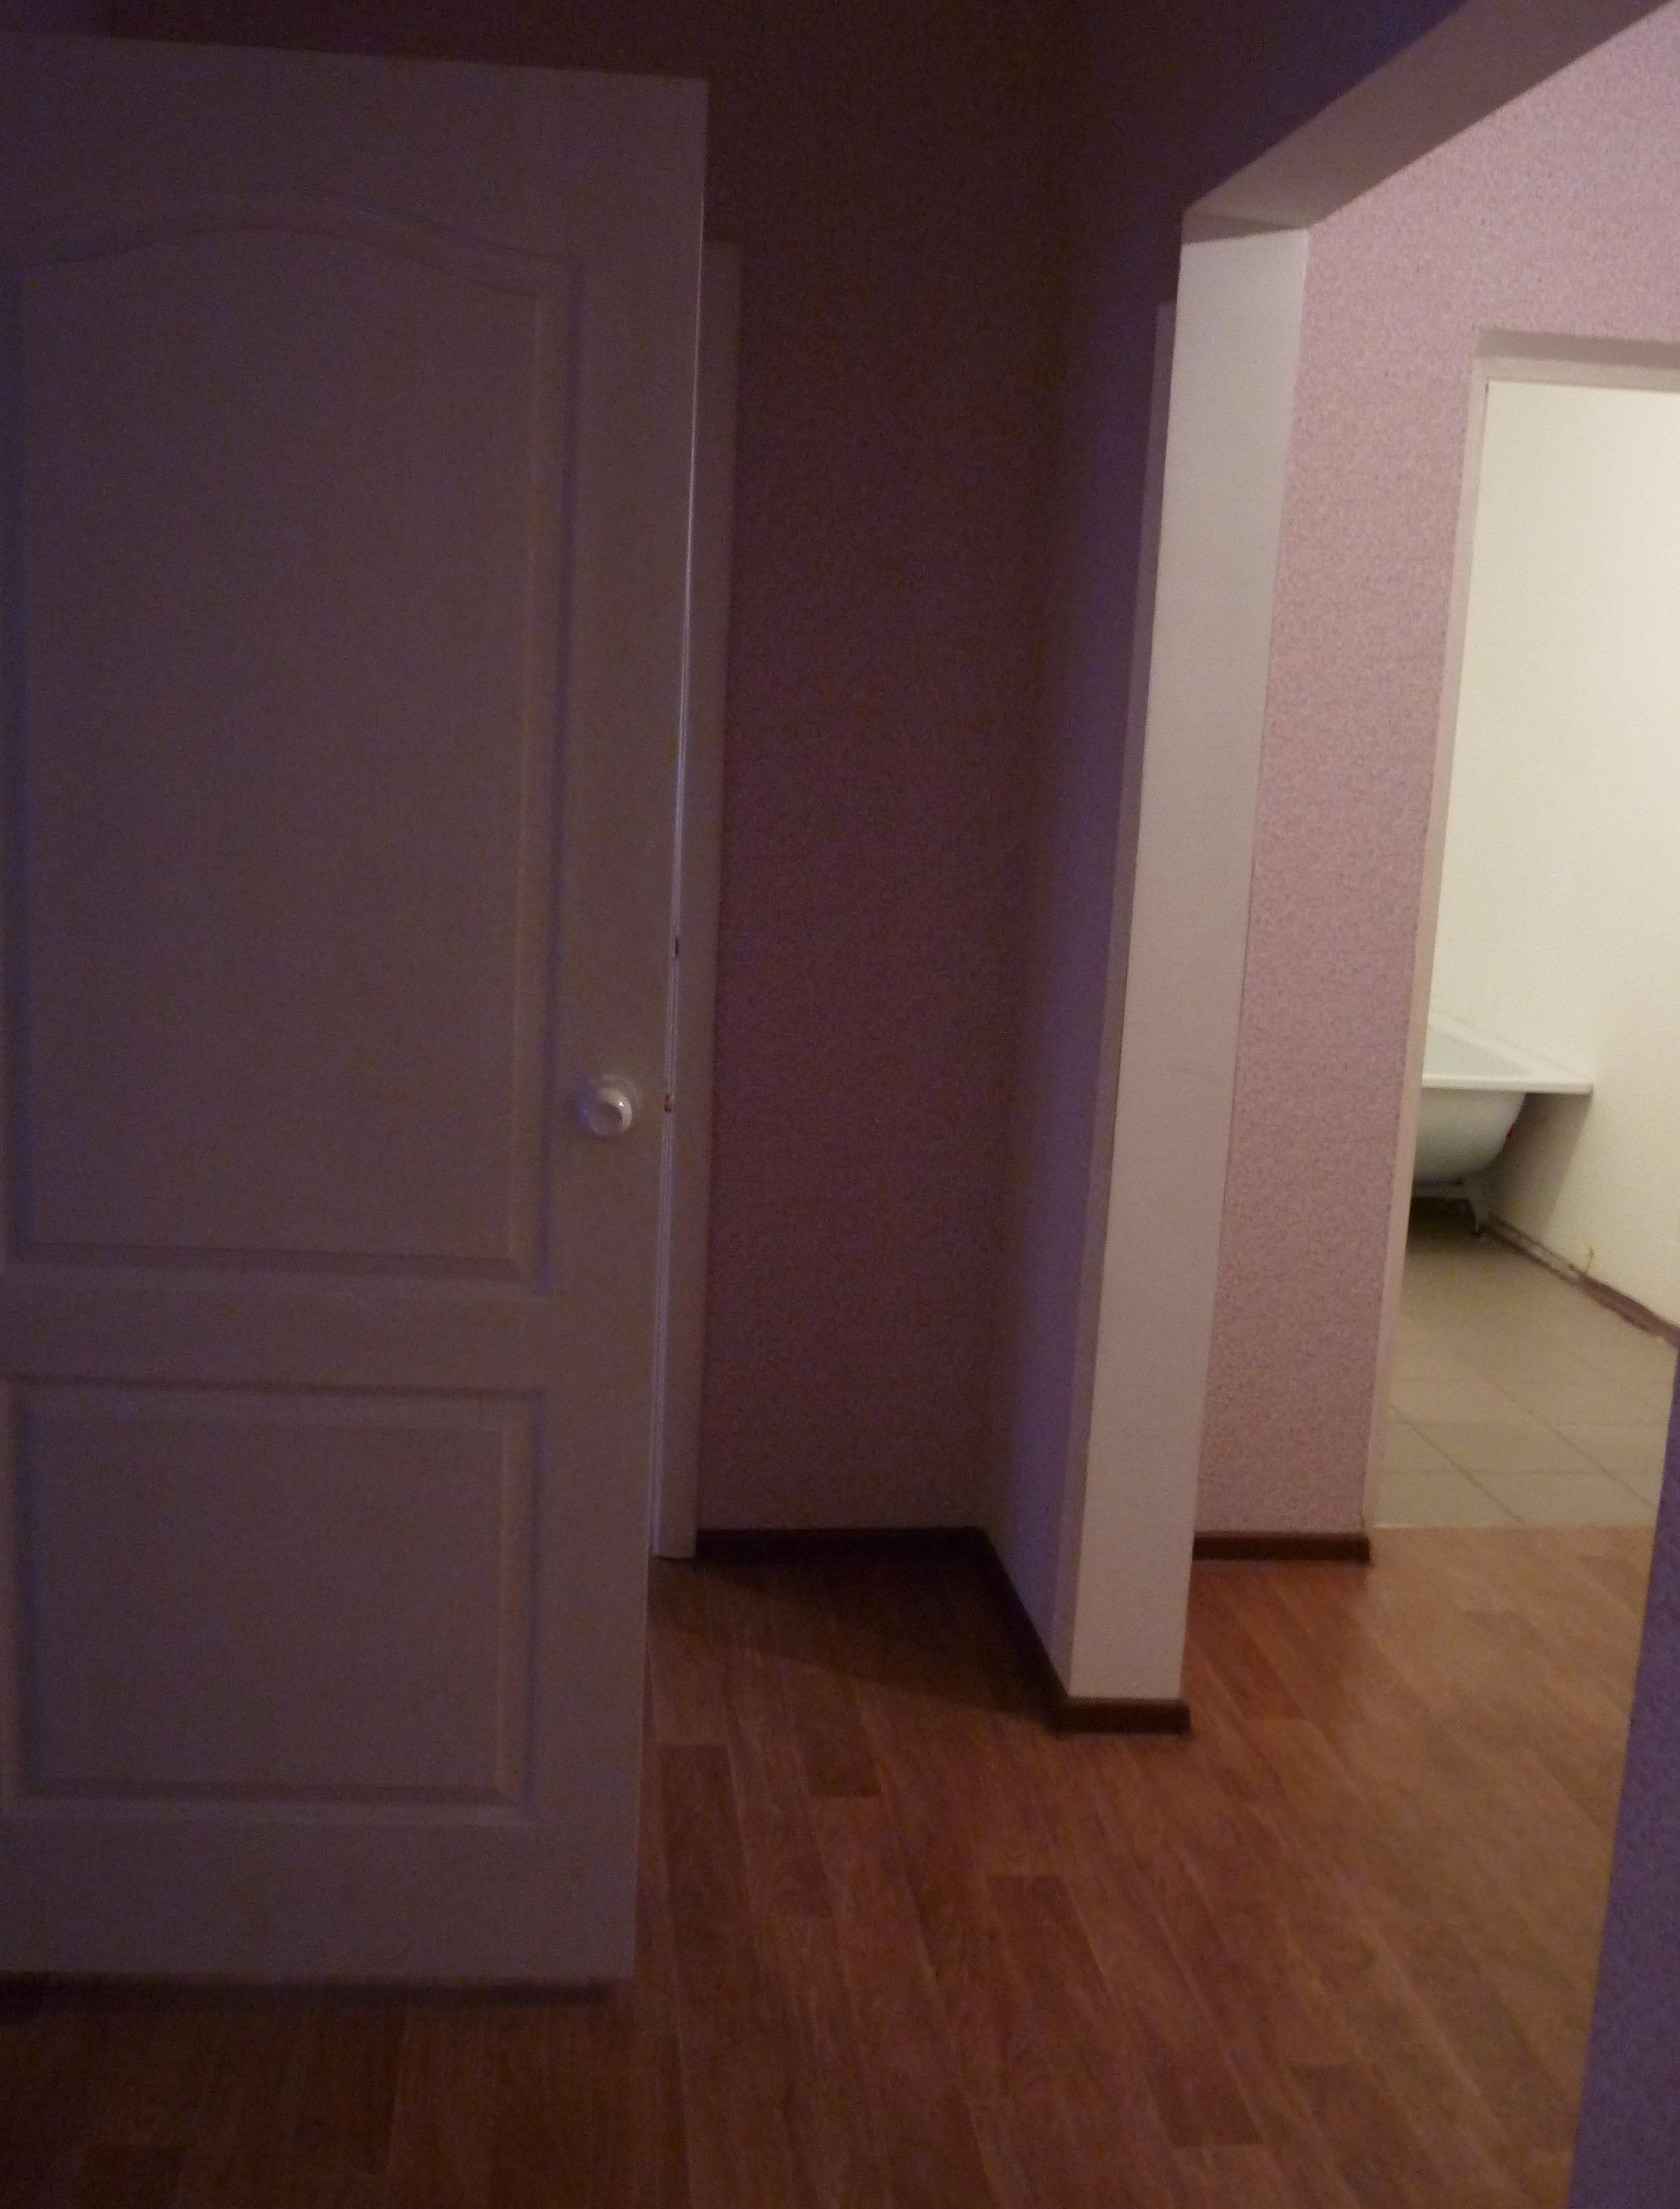 1-к квартира | Краснодар, Рождественская Набережная, р-н ЮМР, 37 фото - 1